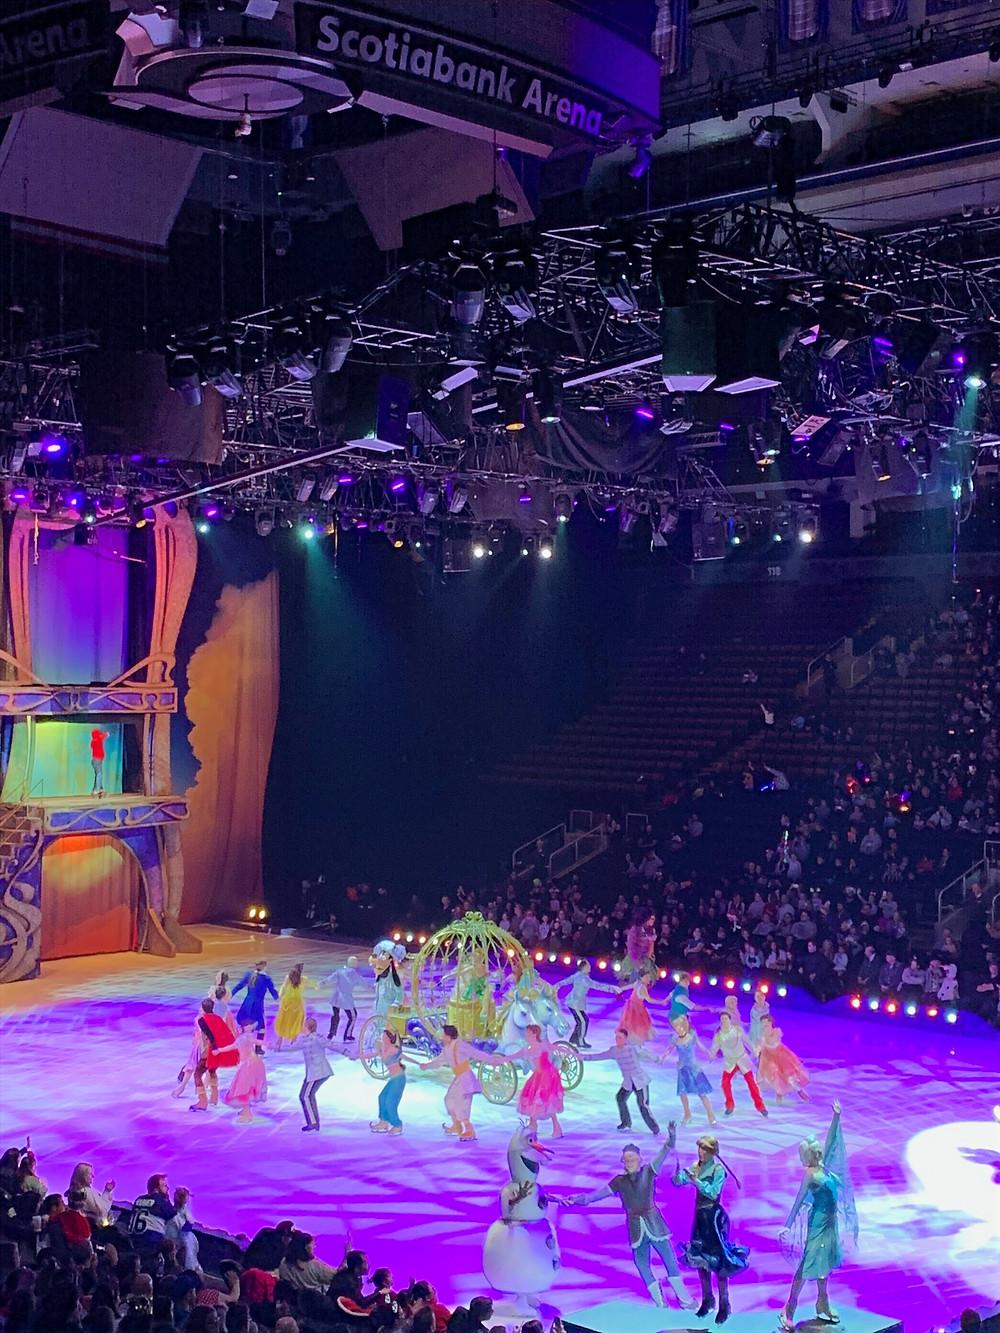 Disney on Ice in Toronto, Ontario